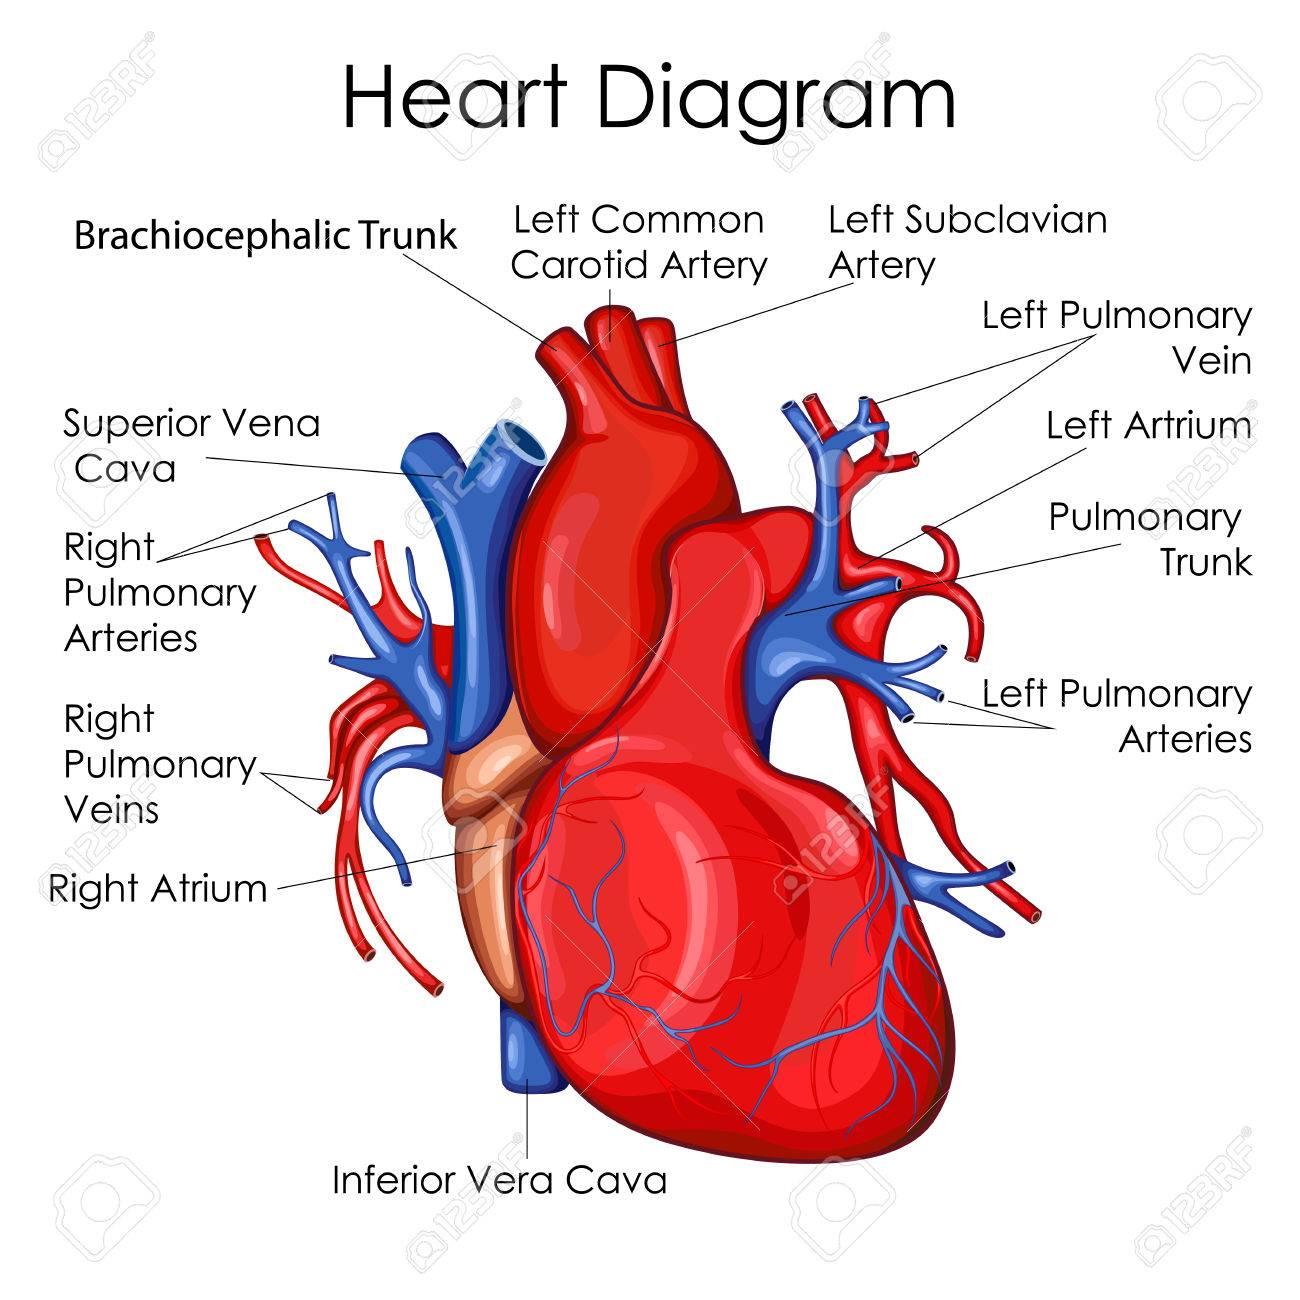 hight resolution of medical education chart of biology for heart diagram vector illustration stock vector 79651874